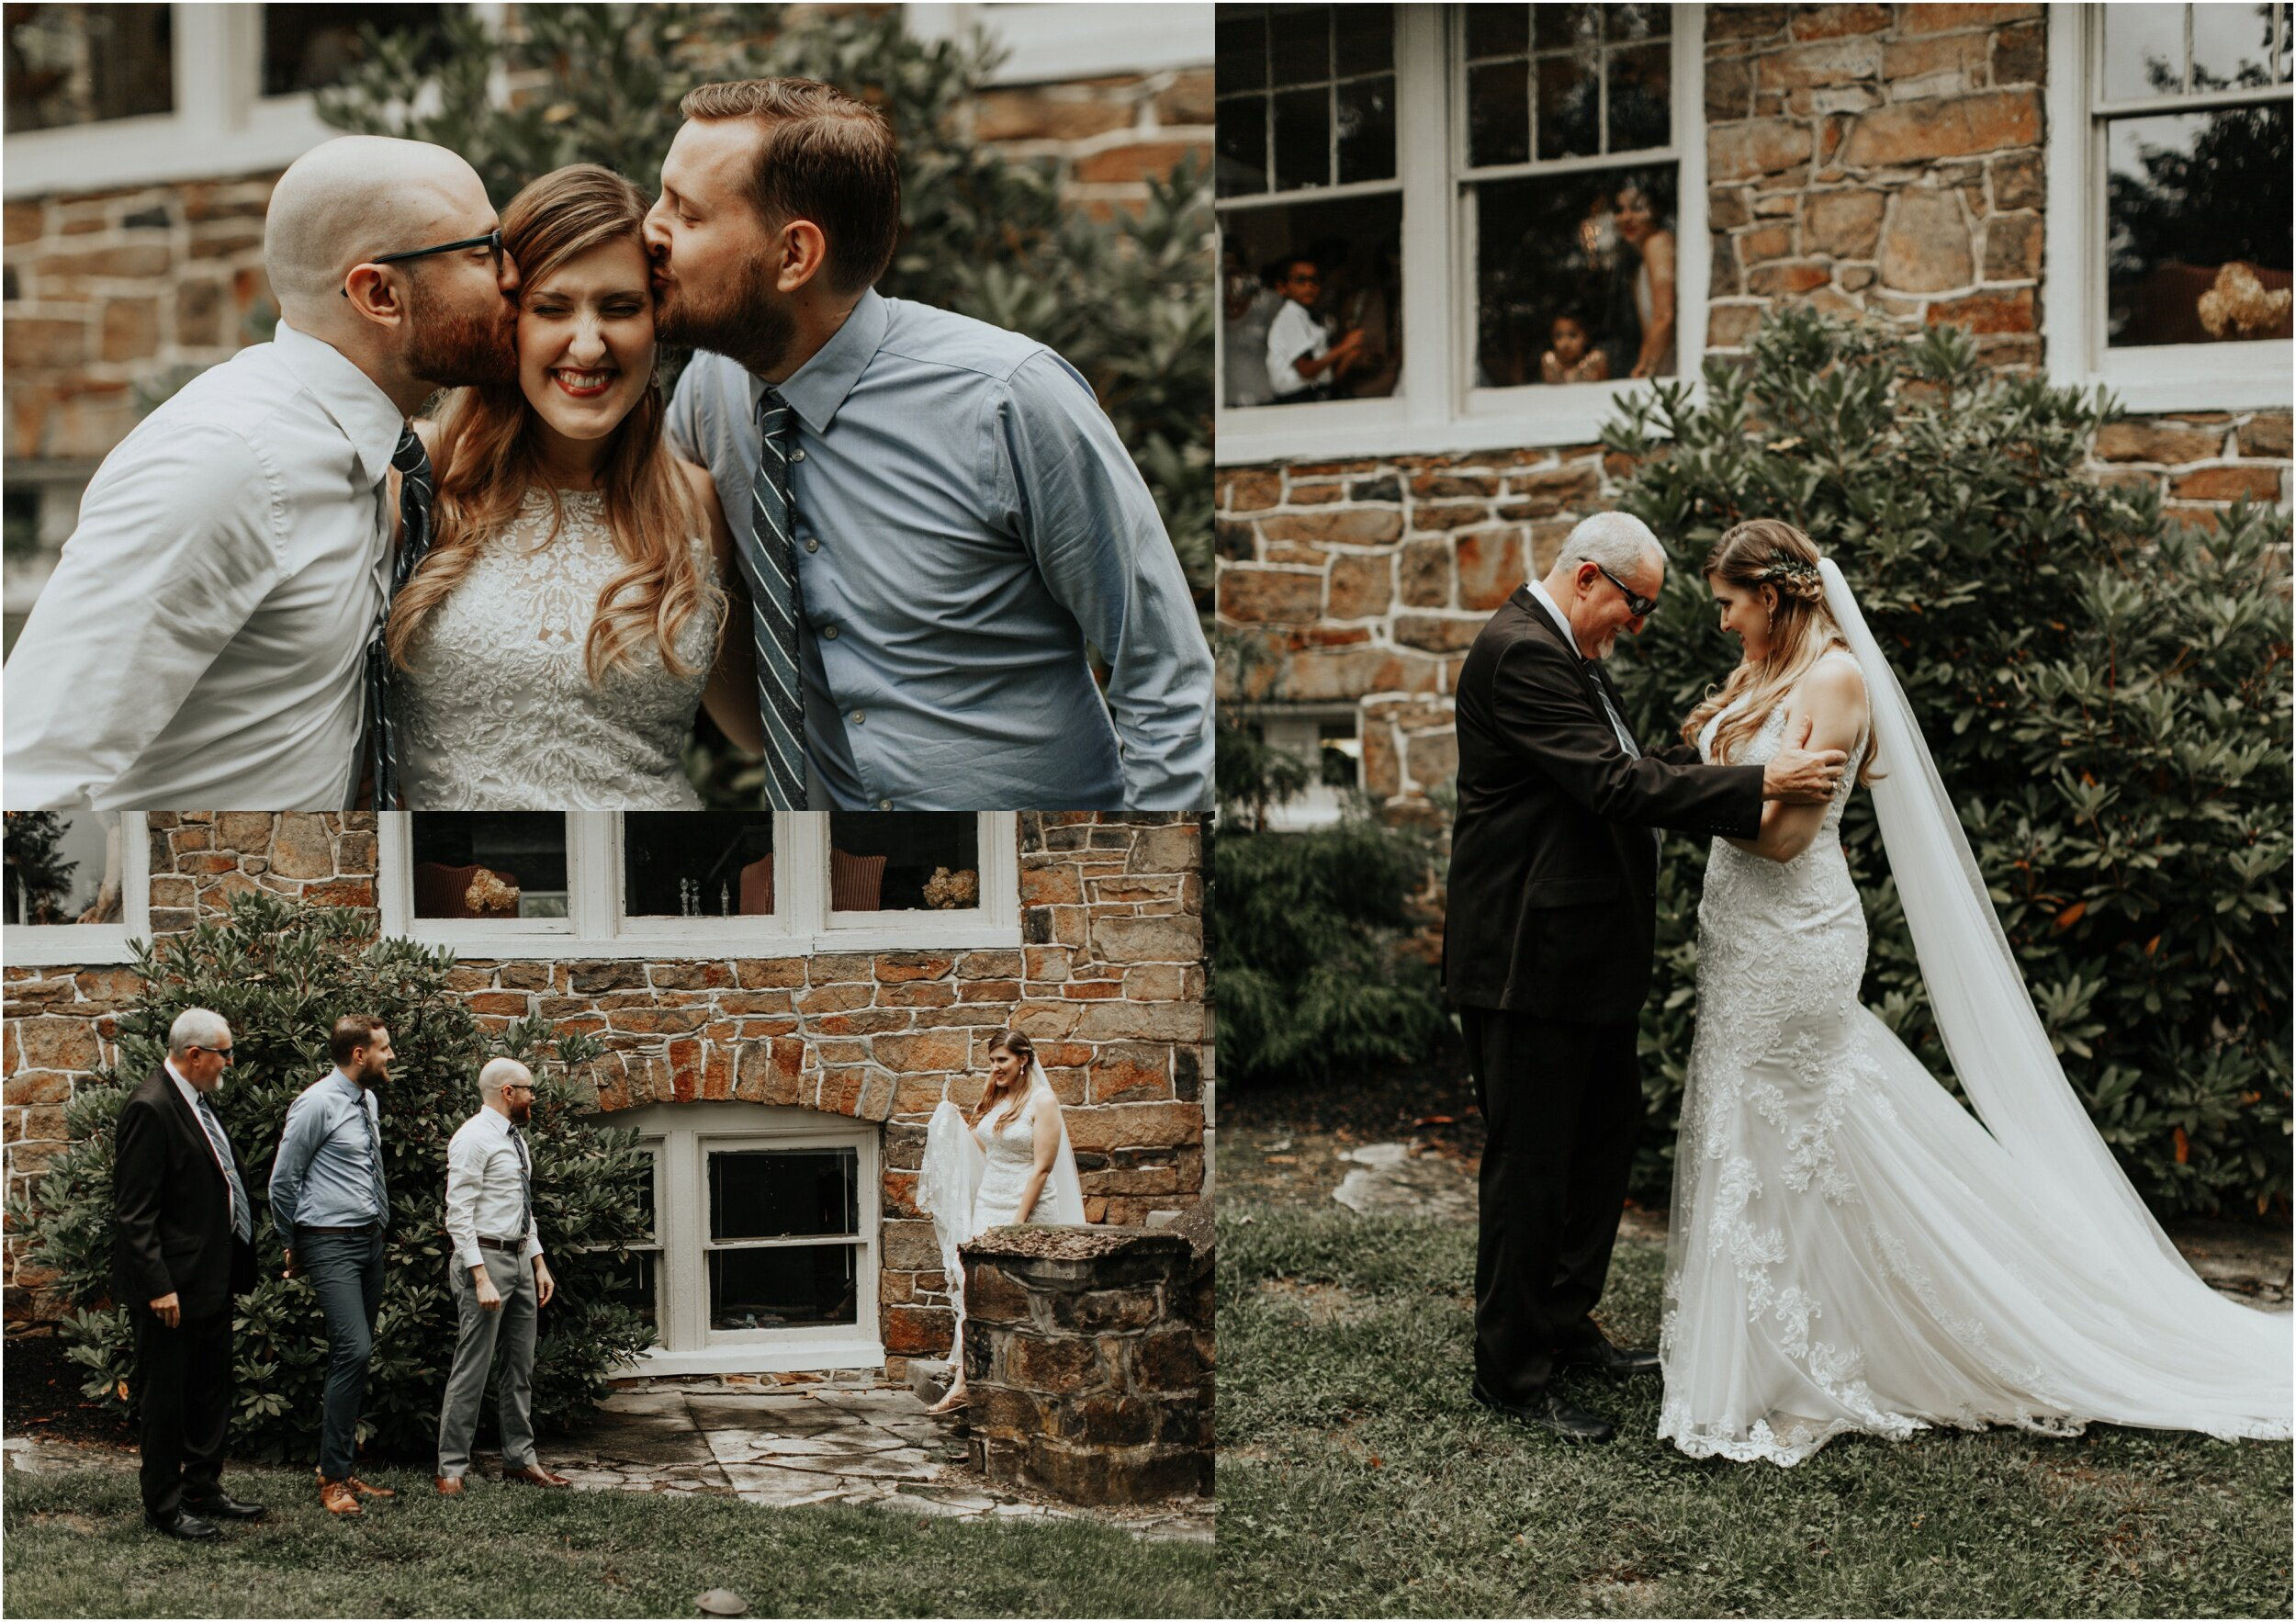 steph-and-jordan-cox-our-wedding-historic-shady-lane-compass-wedding-collective-hazel-lining-photography-destination-elopement-wedding-engagement-photography_0020.jpg